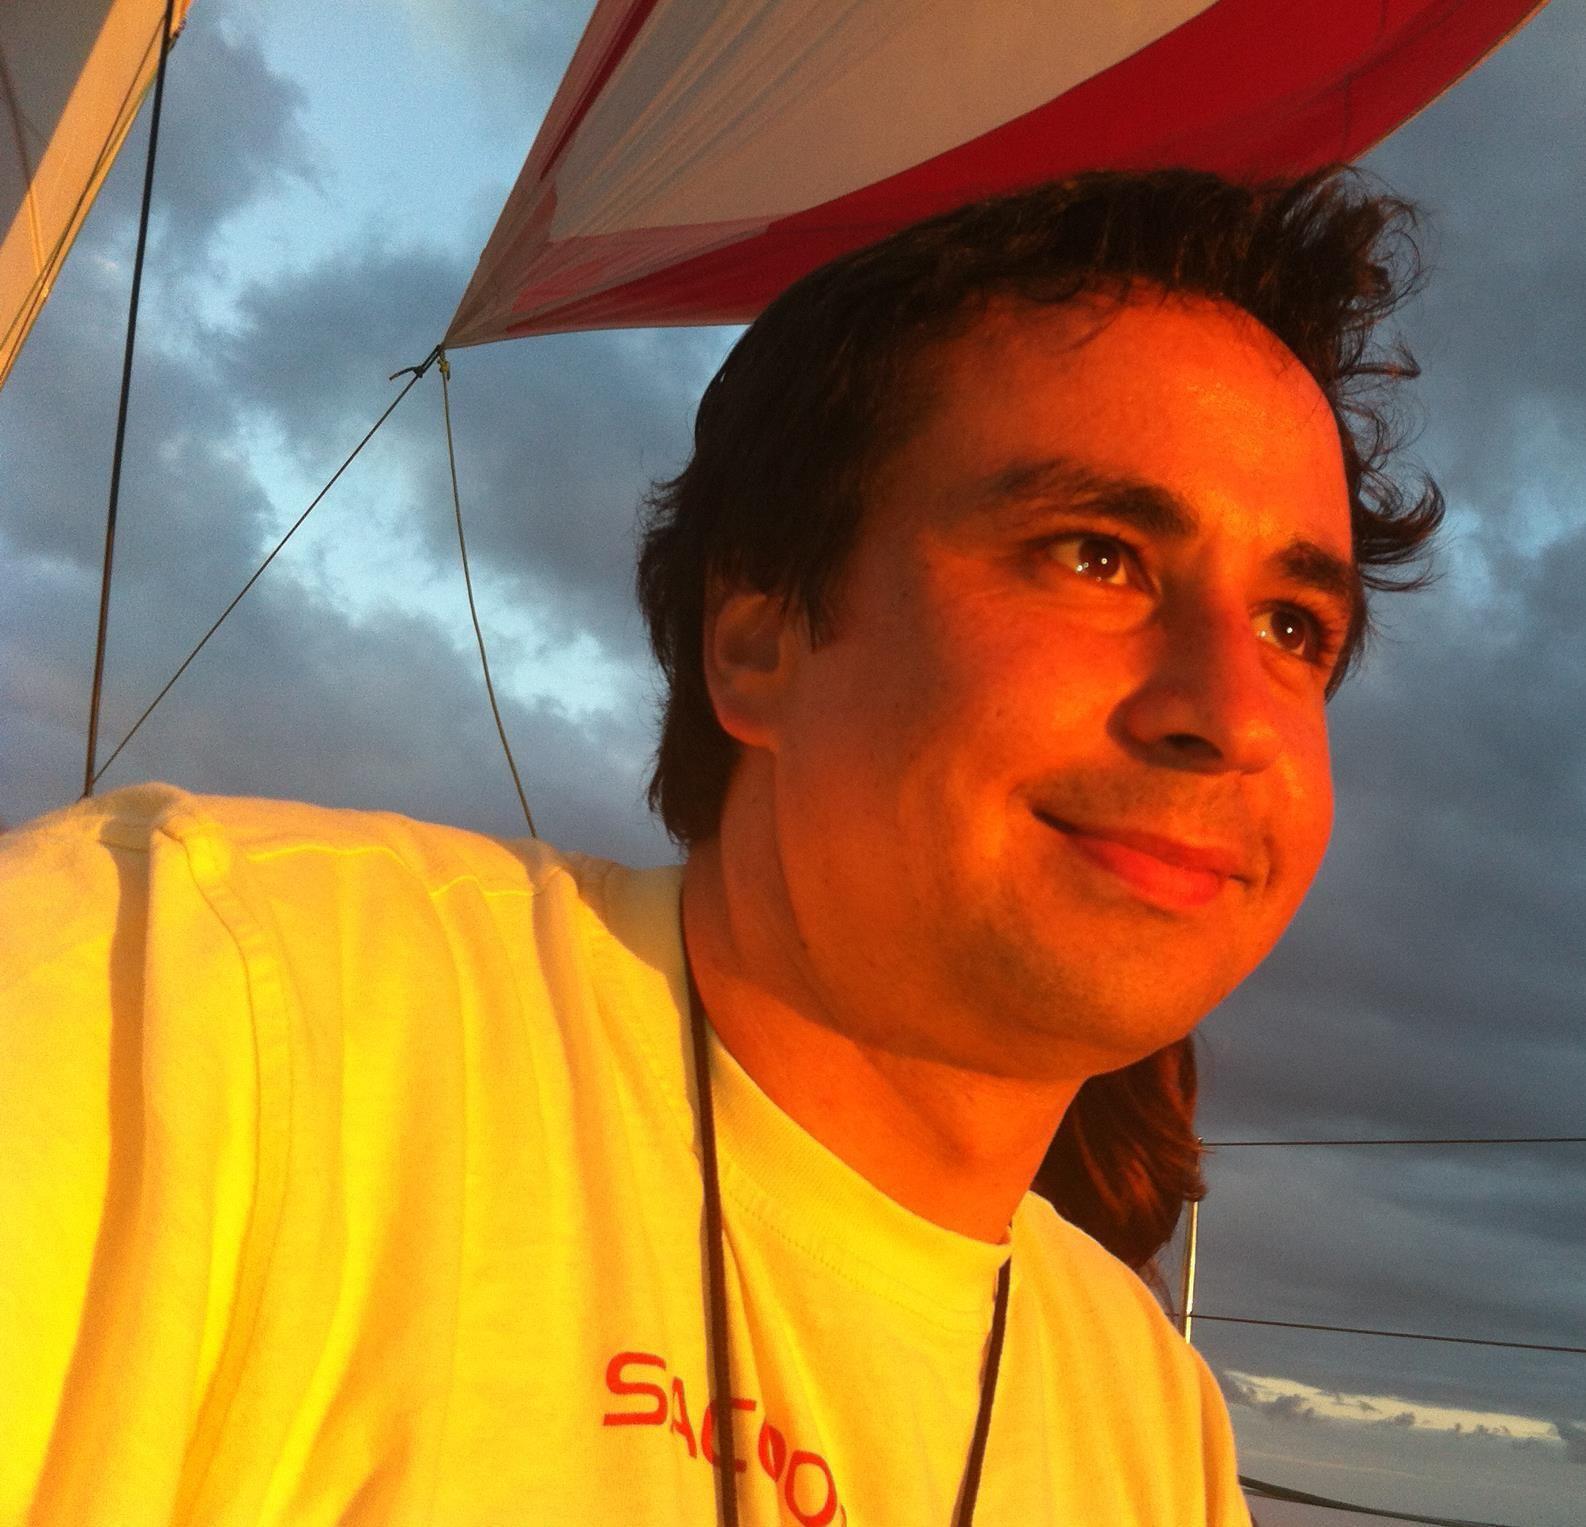 AntonioTrindade